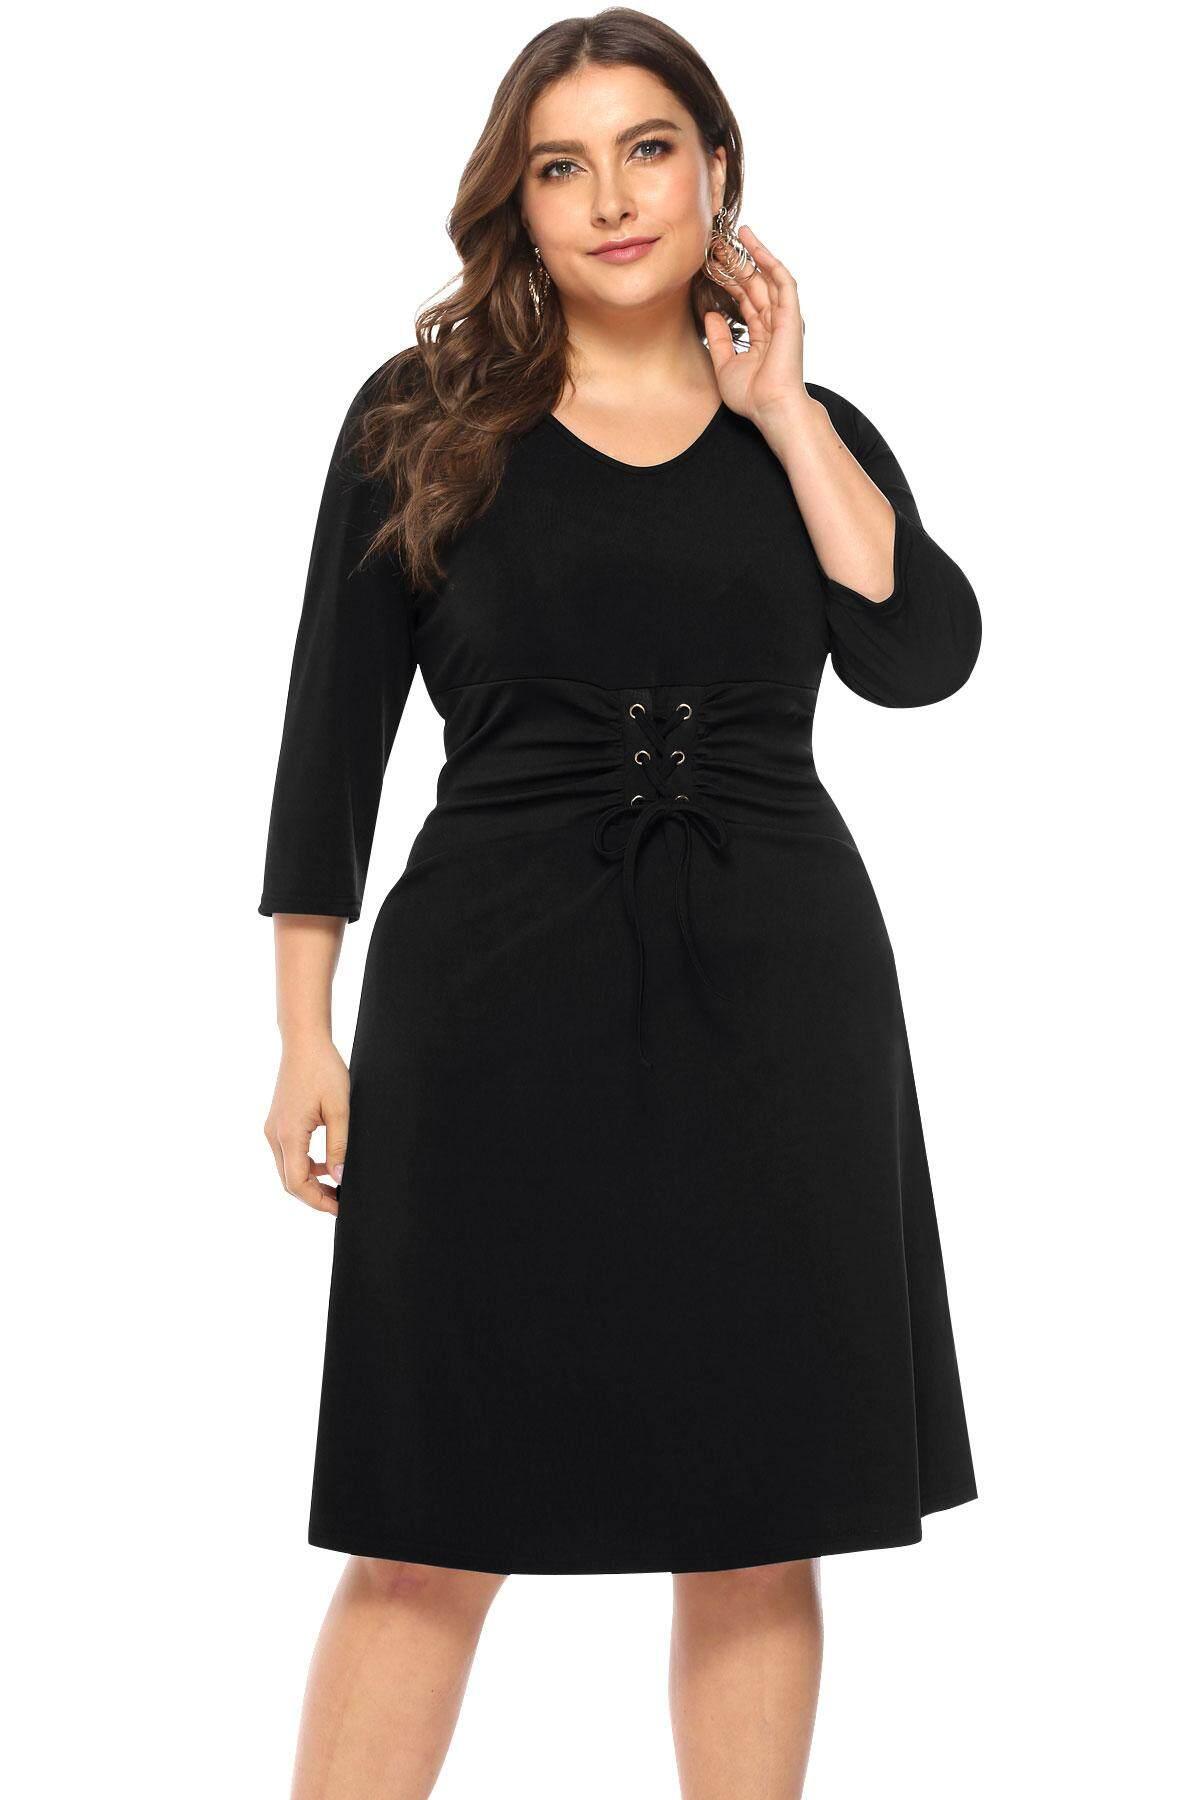 23ddae77c9fa0  Buy 1 Item Shipping Free  Plus Size Dress Autumn Winter Women Plus